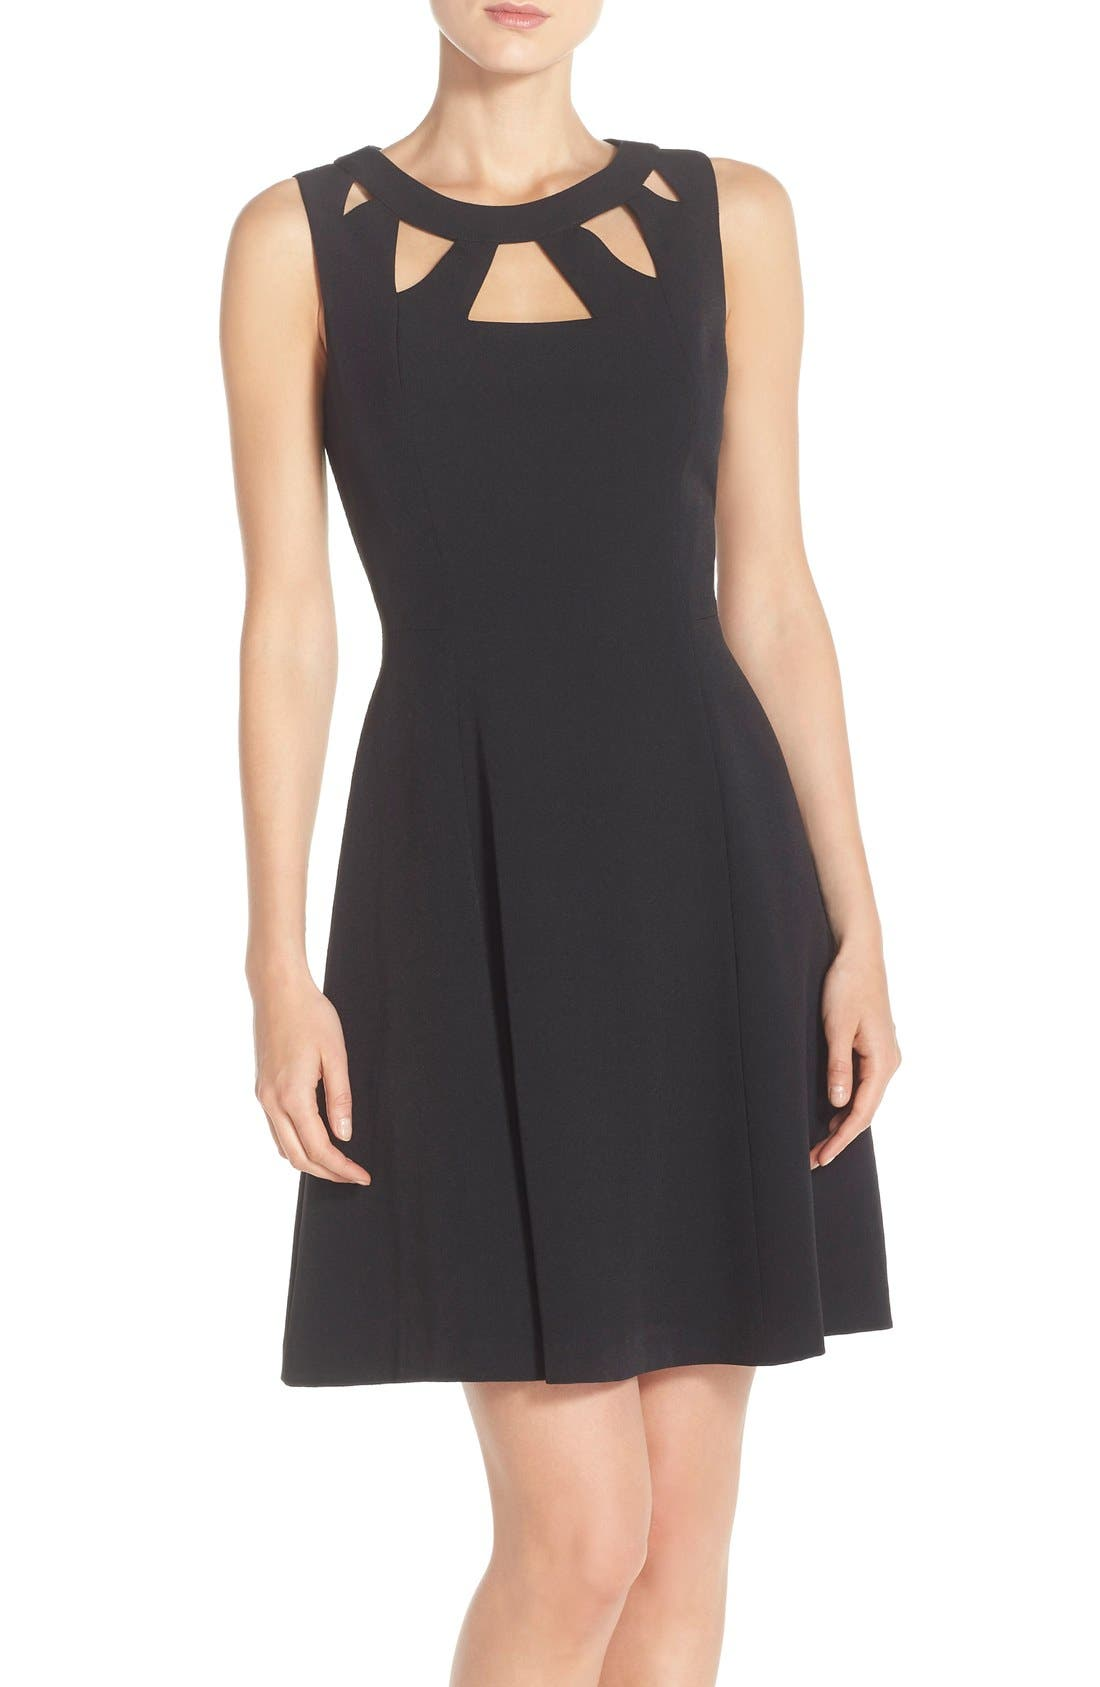 Alternate Image 1 Selected - Eliza J Cutout Crepe Fit & Flare Dress